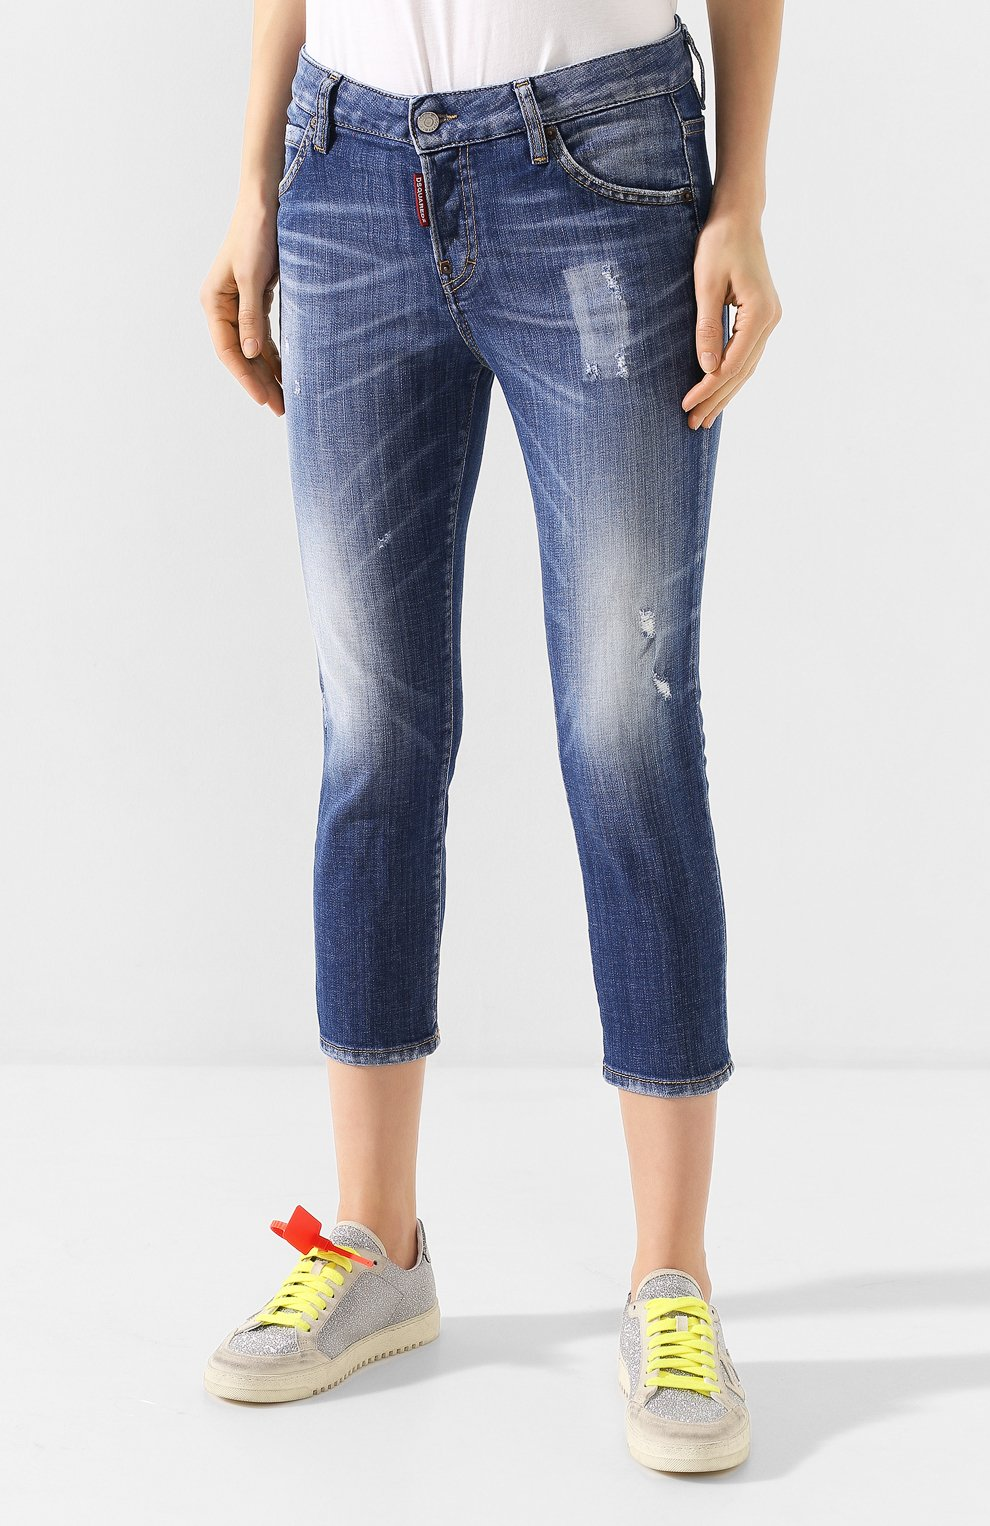 Женские джинсы DSQUARED2 синего цвета, арт. S75LB0322/S30342   Фото 3